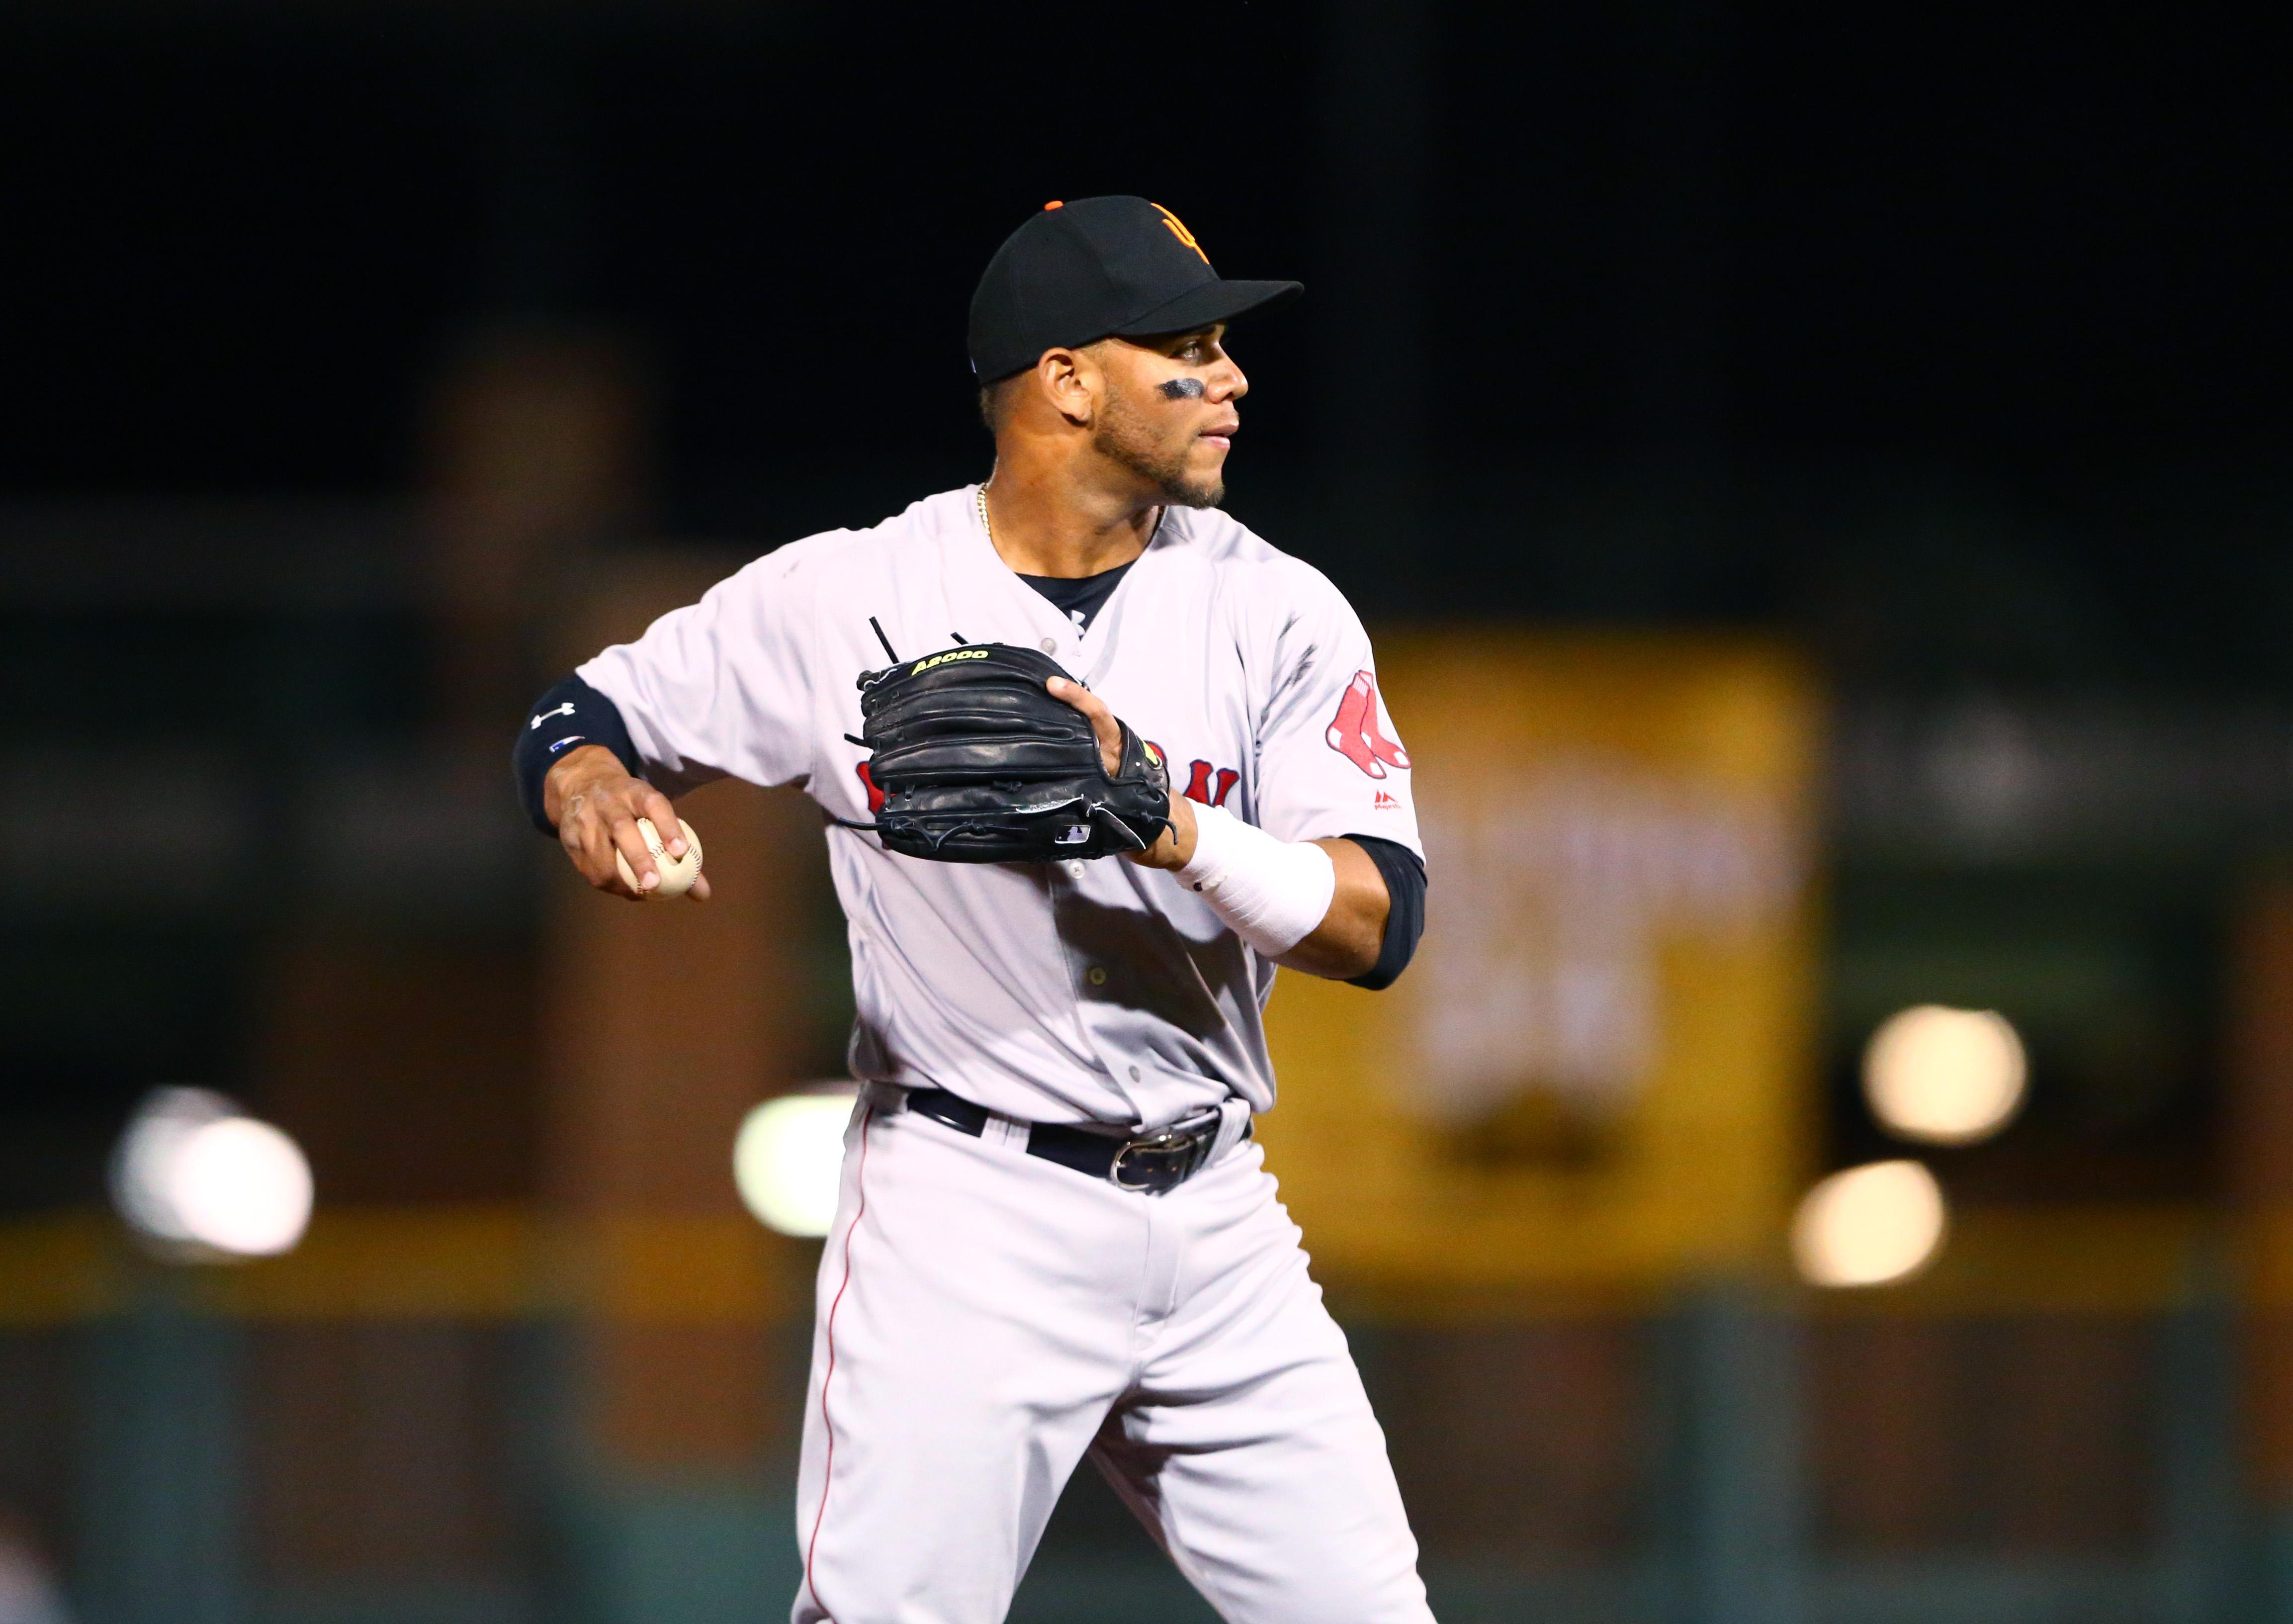 Minor League Baseball: Arizona Fall League-Surprise Saguaros at Scottsdale Scorpions